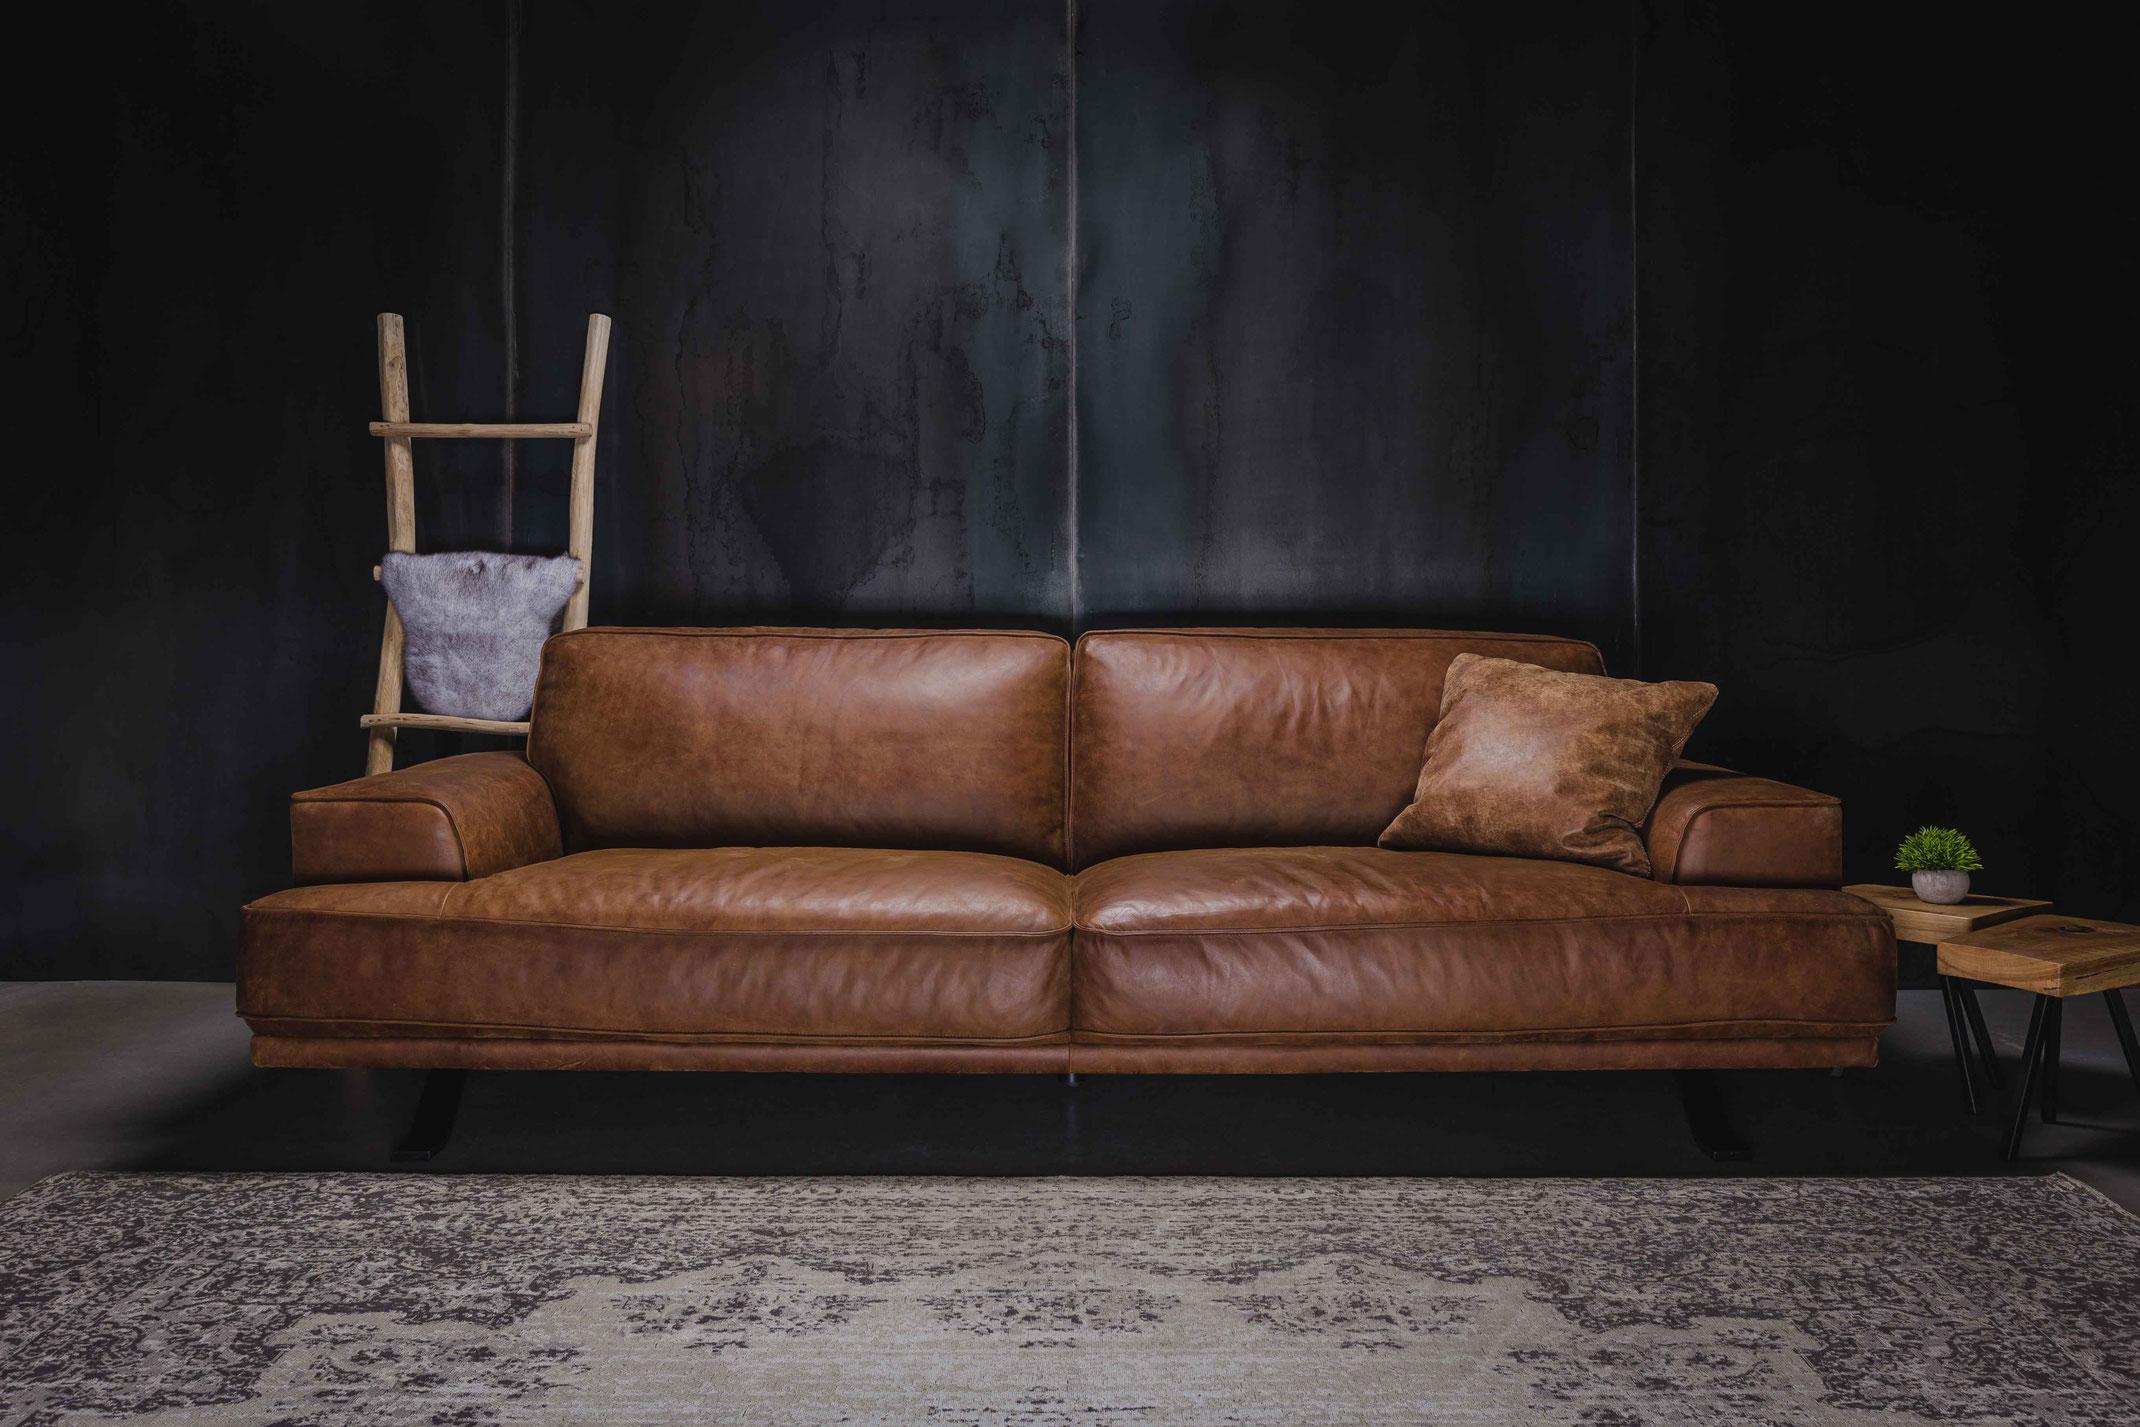 MÖBELLOFT design Sofa MAYBACH in Echtleder, Stoff oder Samt